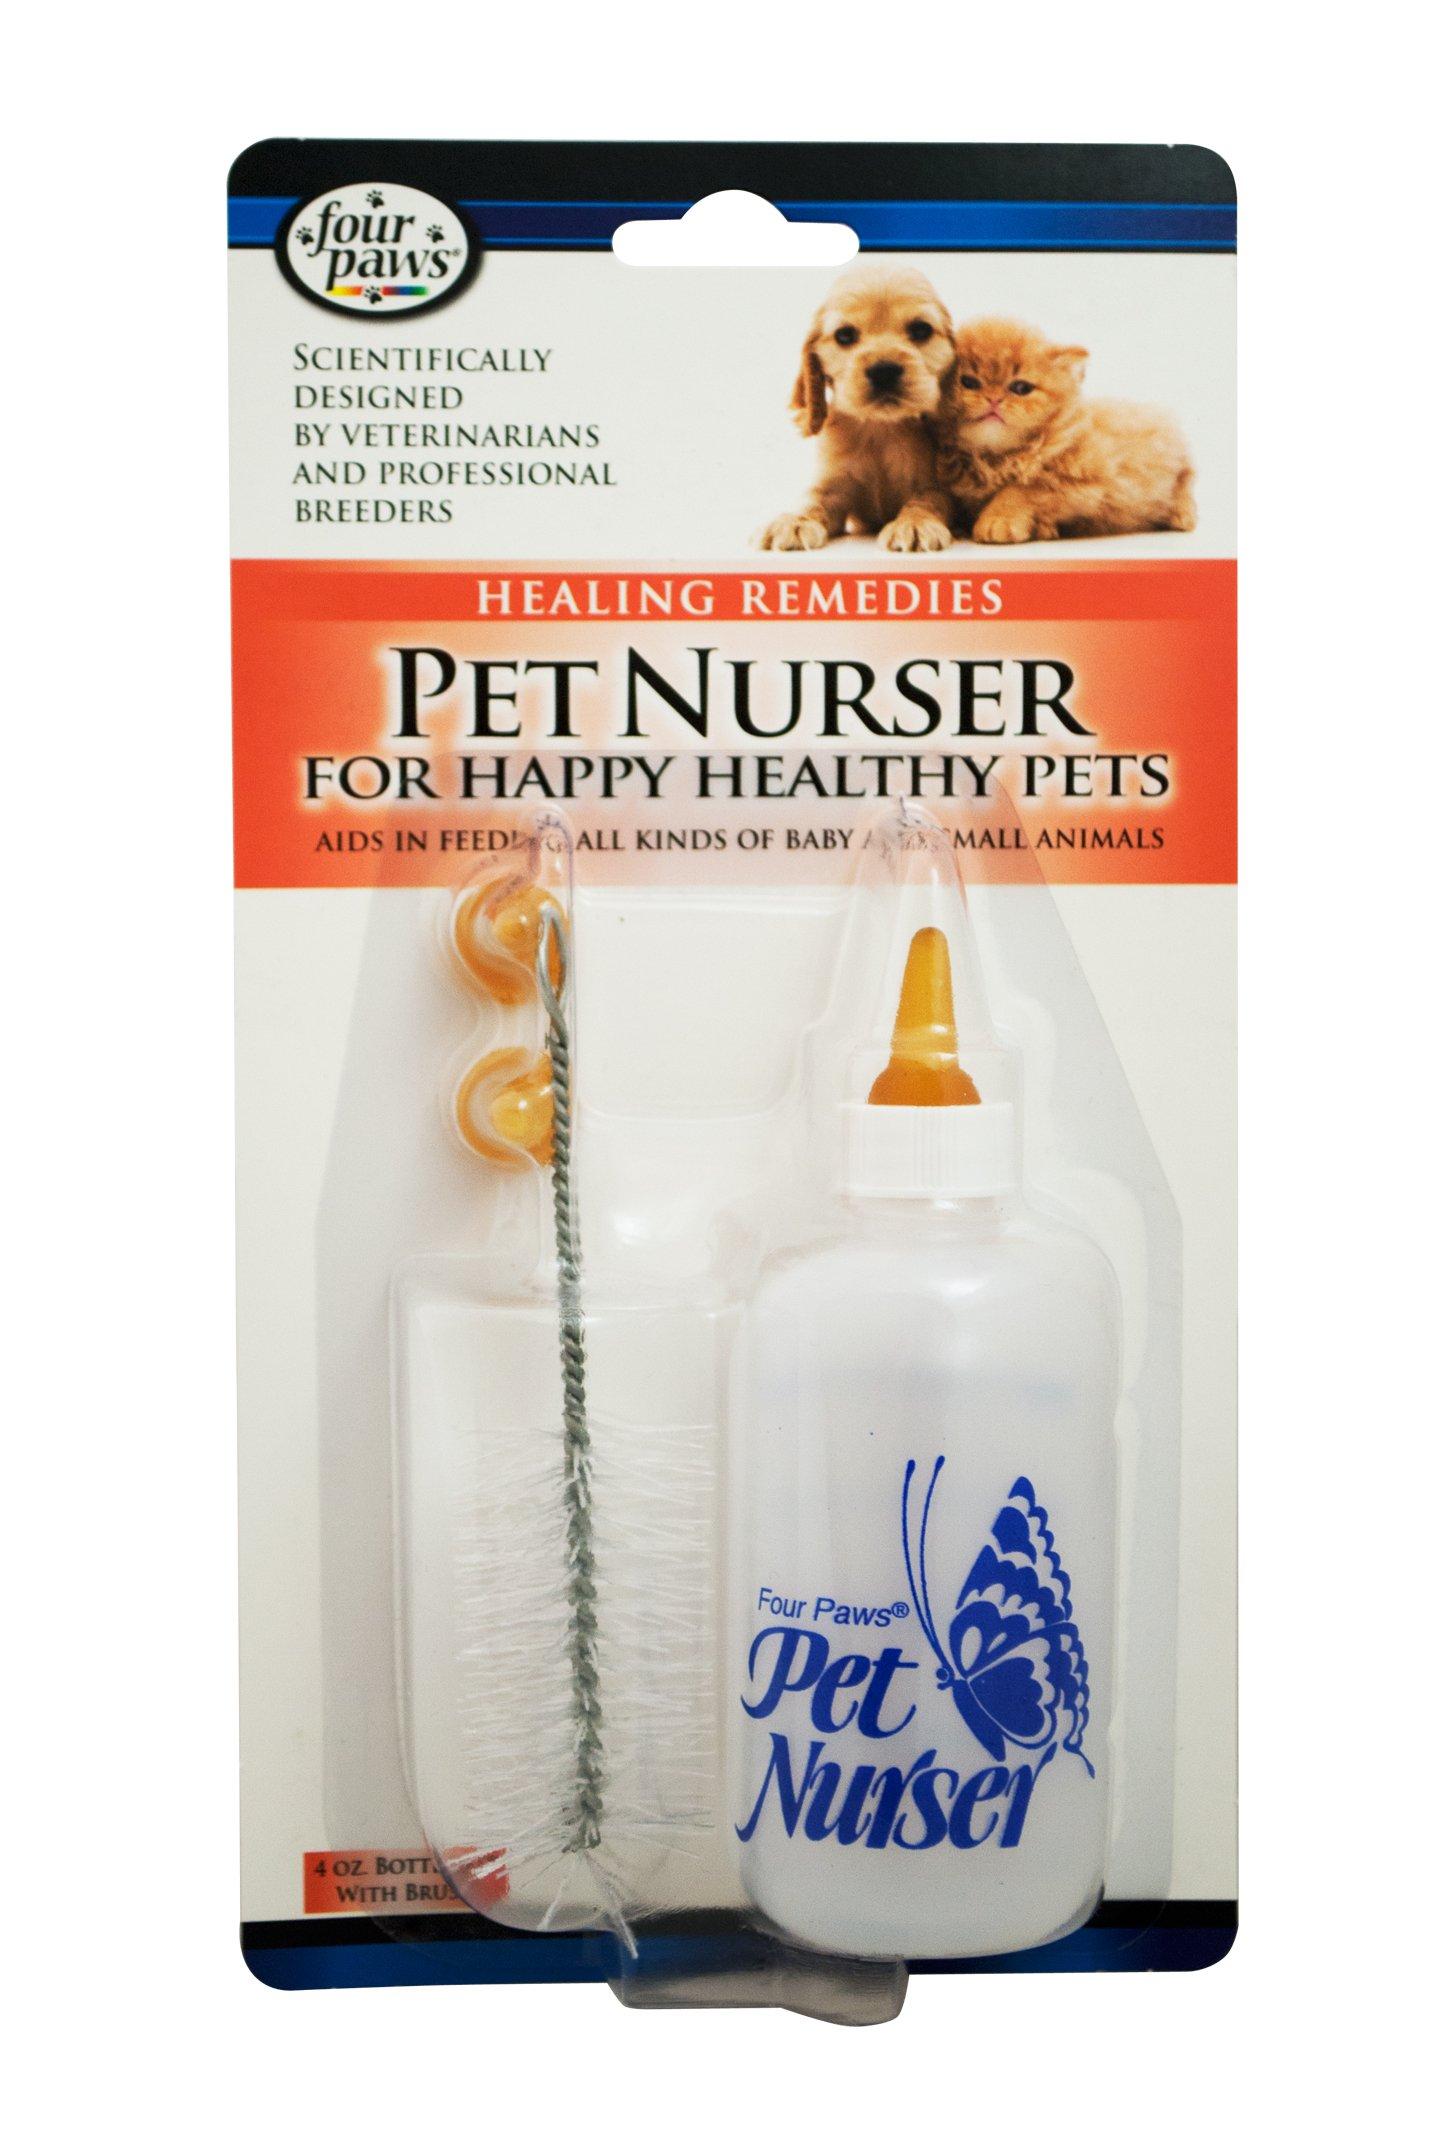 Four Paws Pet Nursing Bottle Kit Single Unit 4 oz.